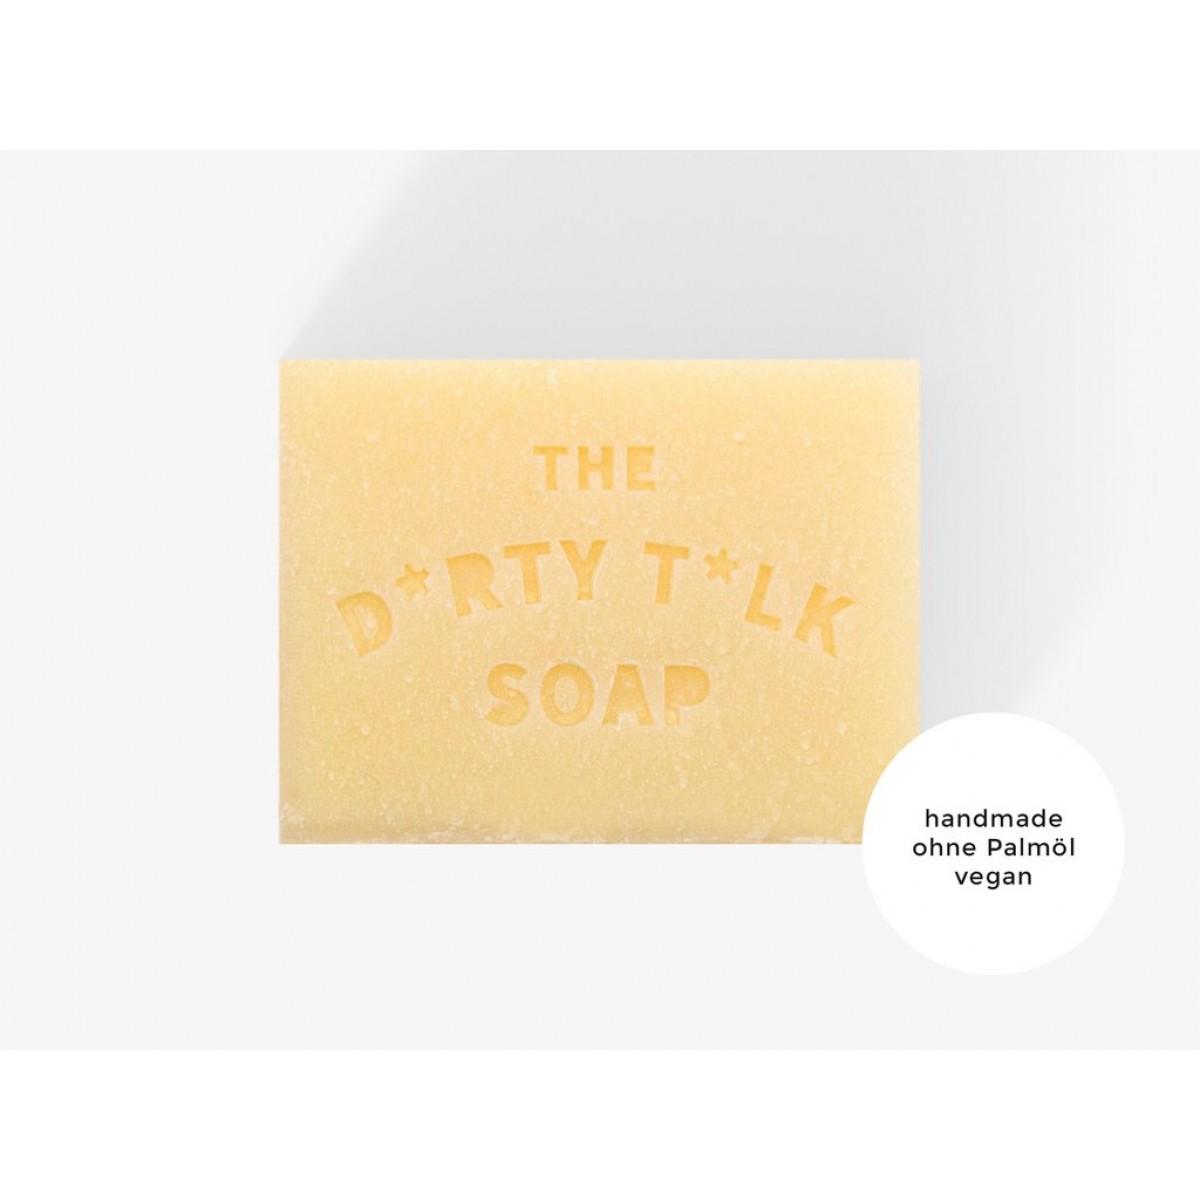 typealive / THE D*RTY T*LK SOAP / Schmutziges Spülchen